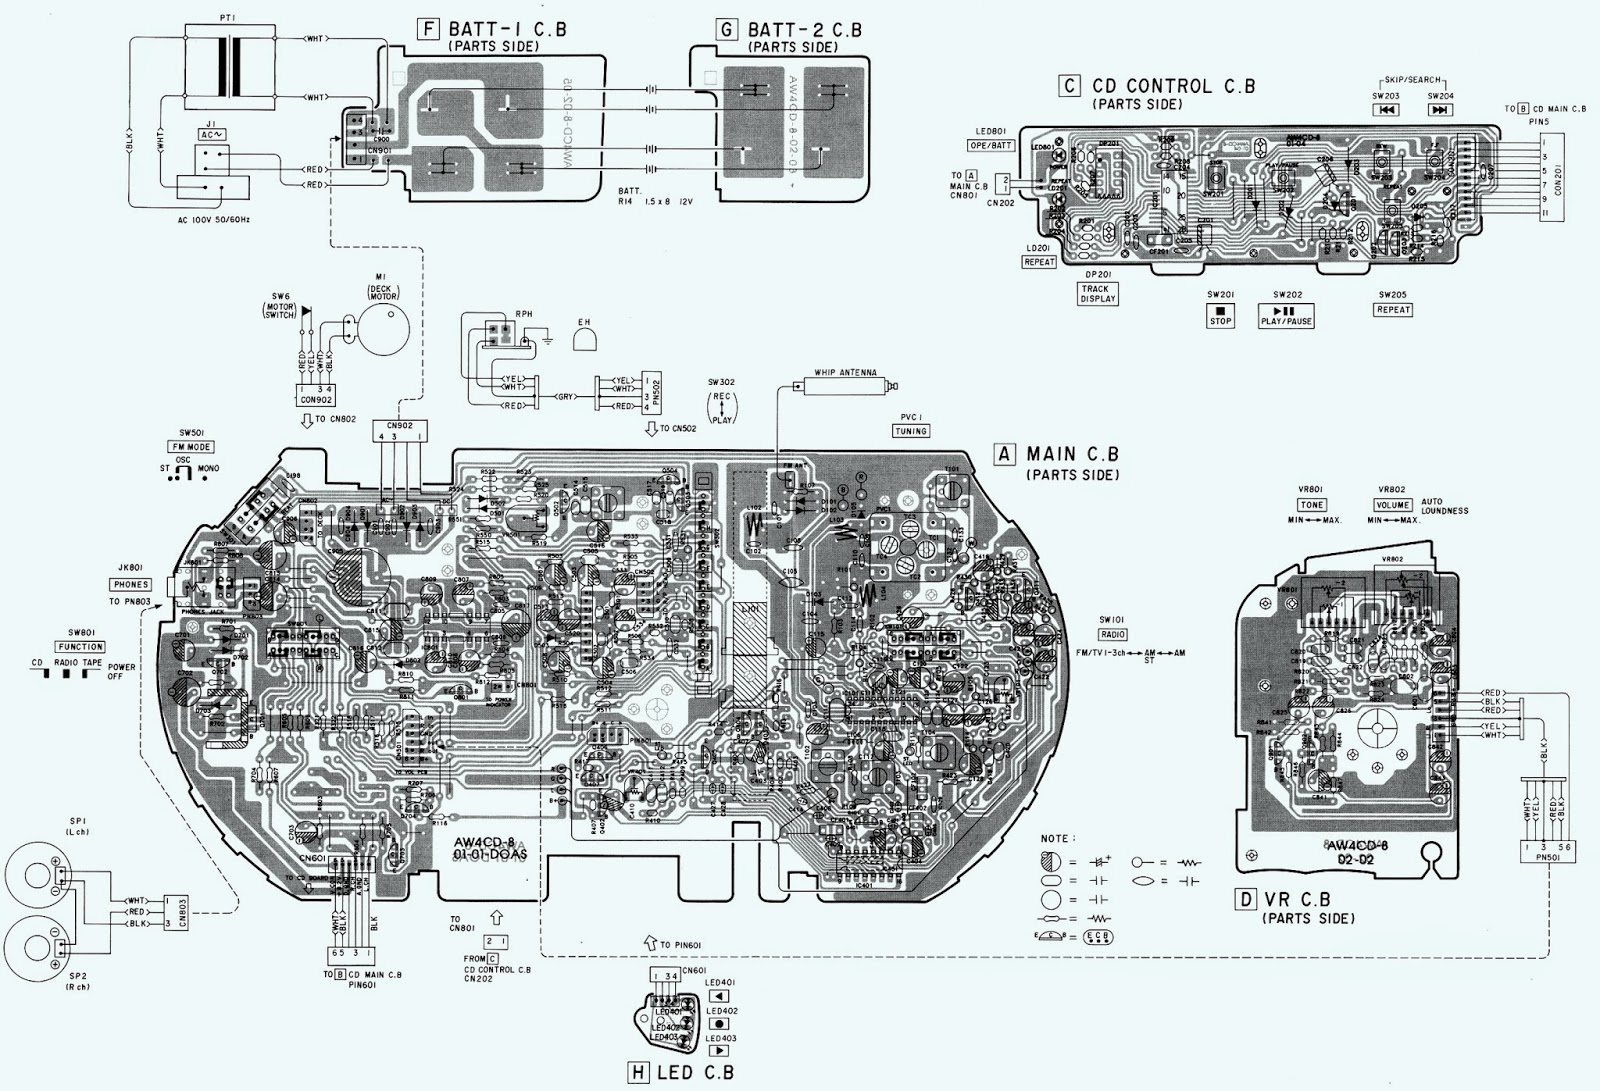 Aiwa Radio Wiring Diagram | Wiring Diagram on